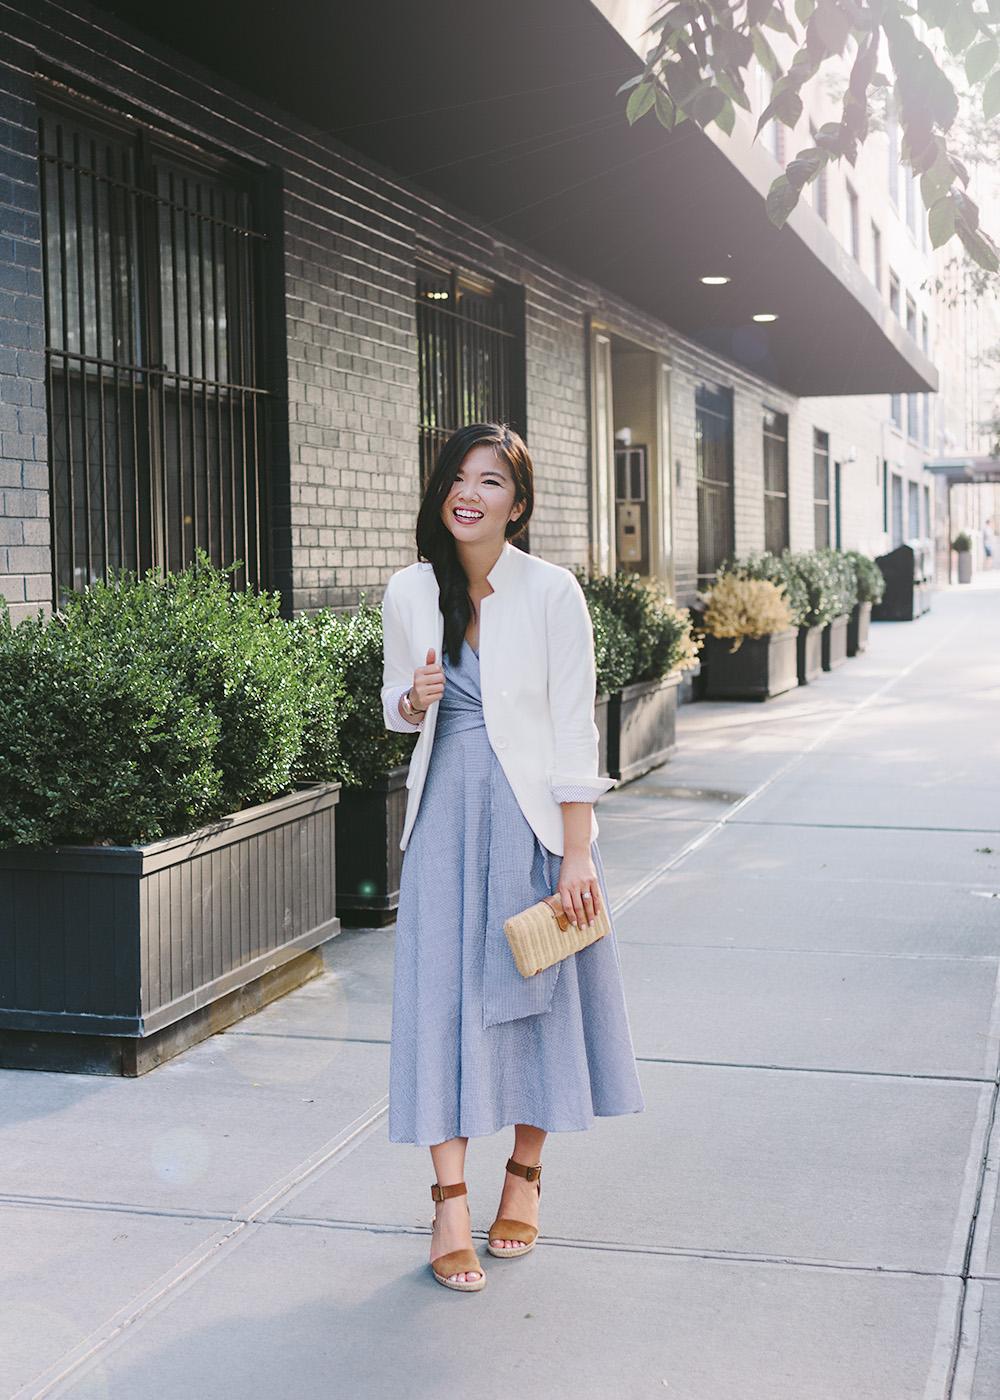 Gingham Wrap Dress & White Blazer